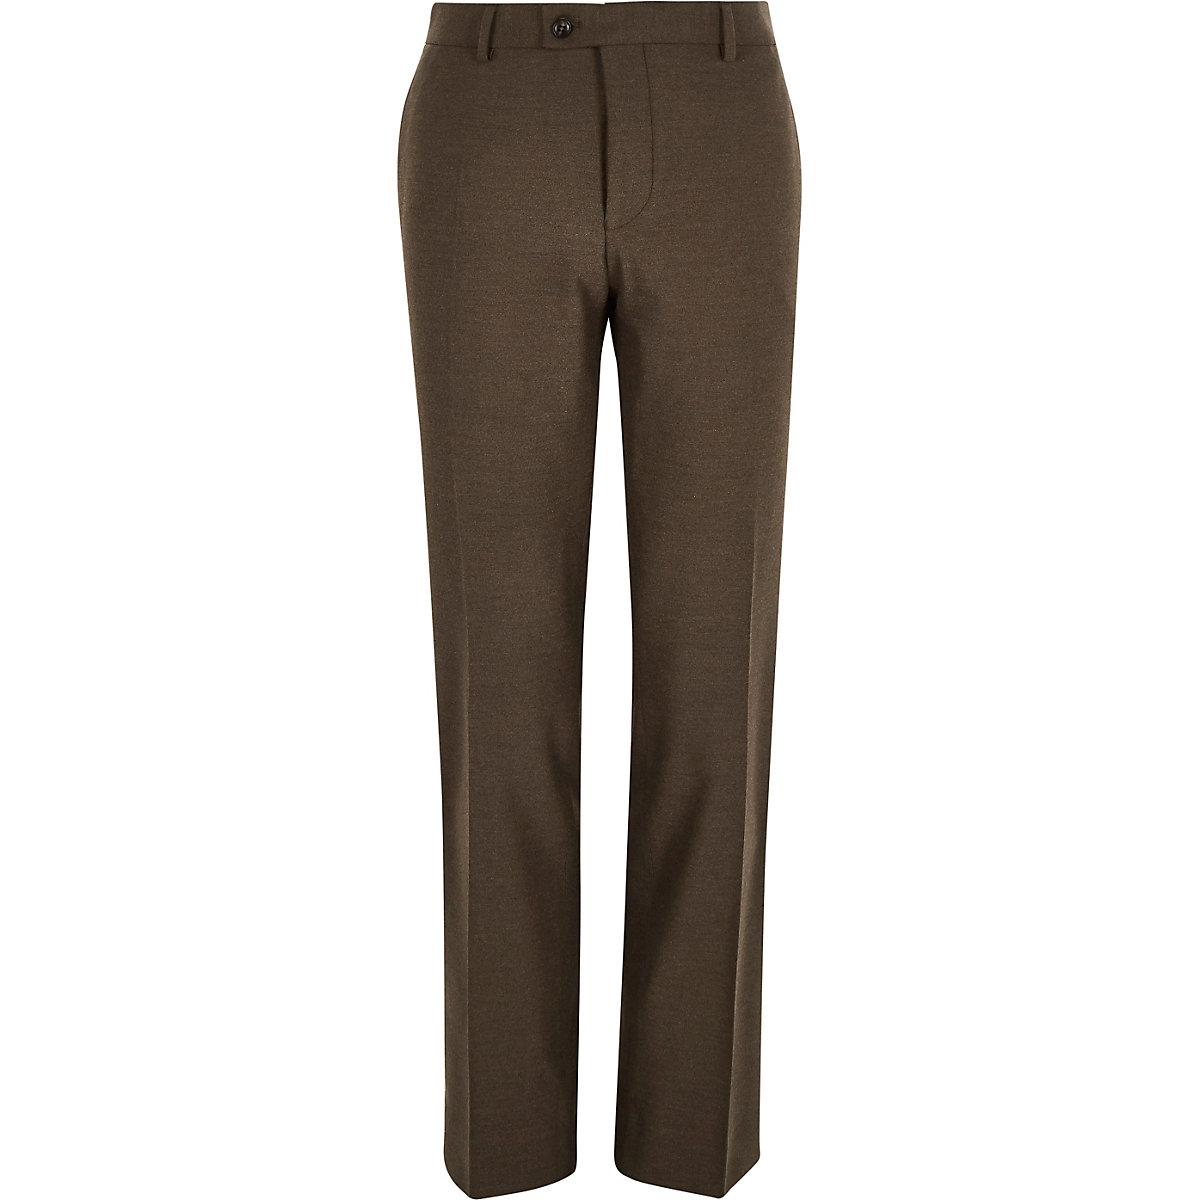 Brown tailored slim suit pants